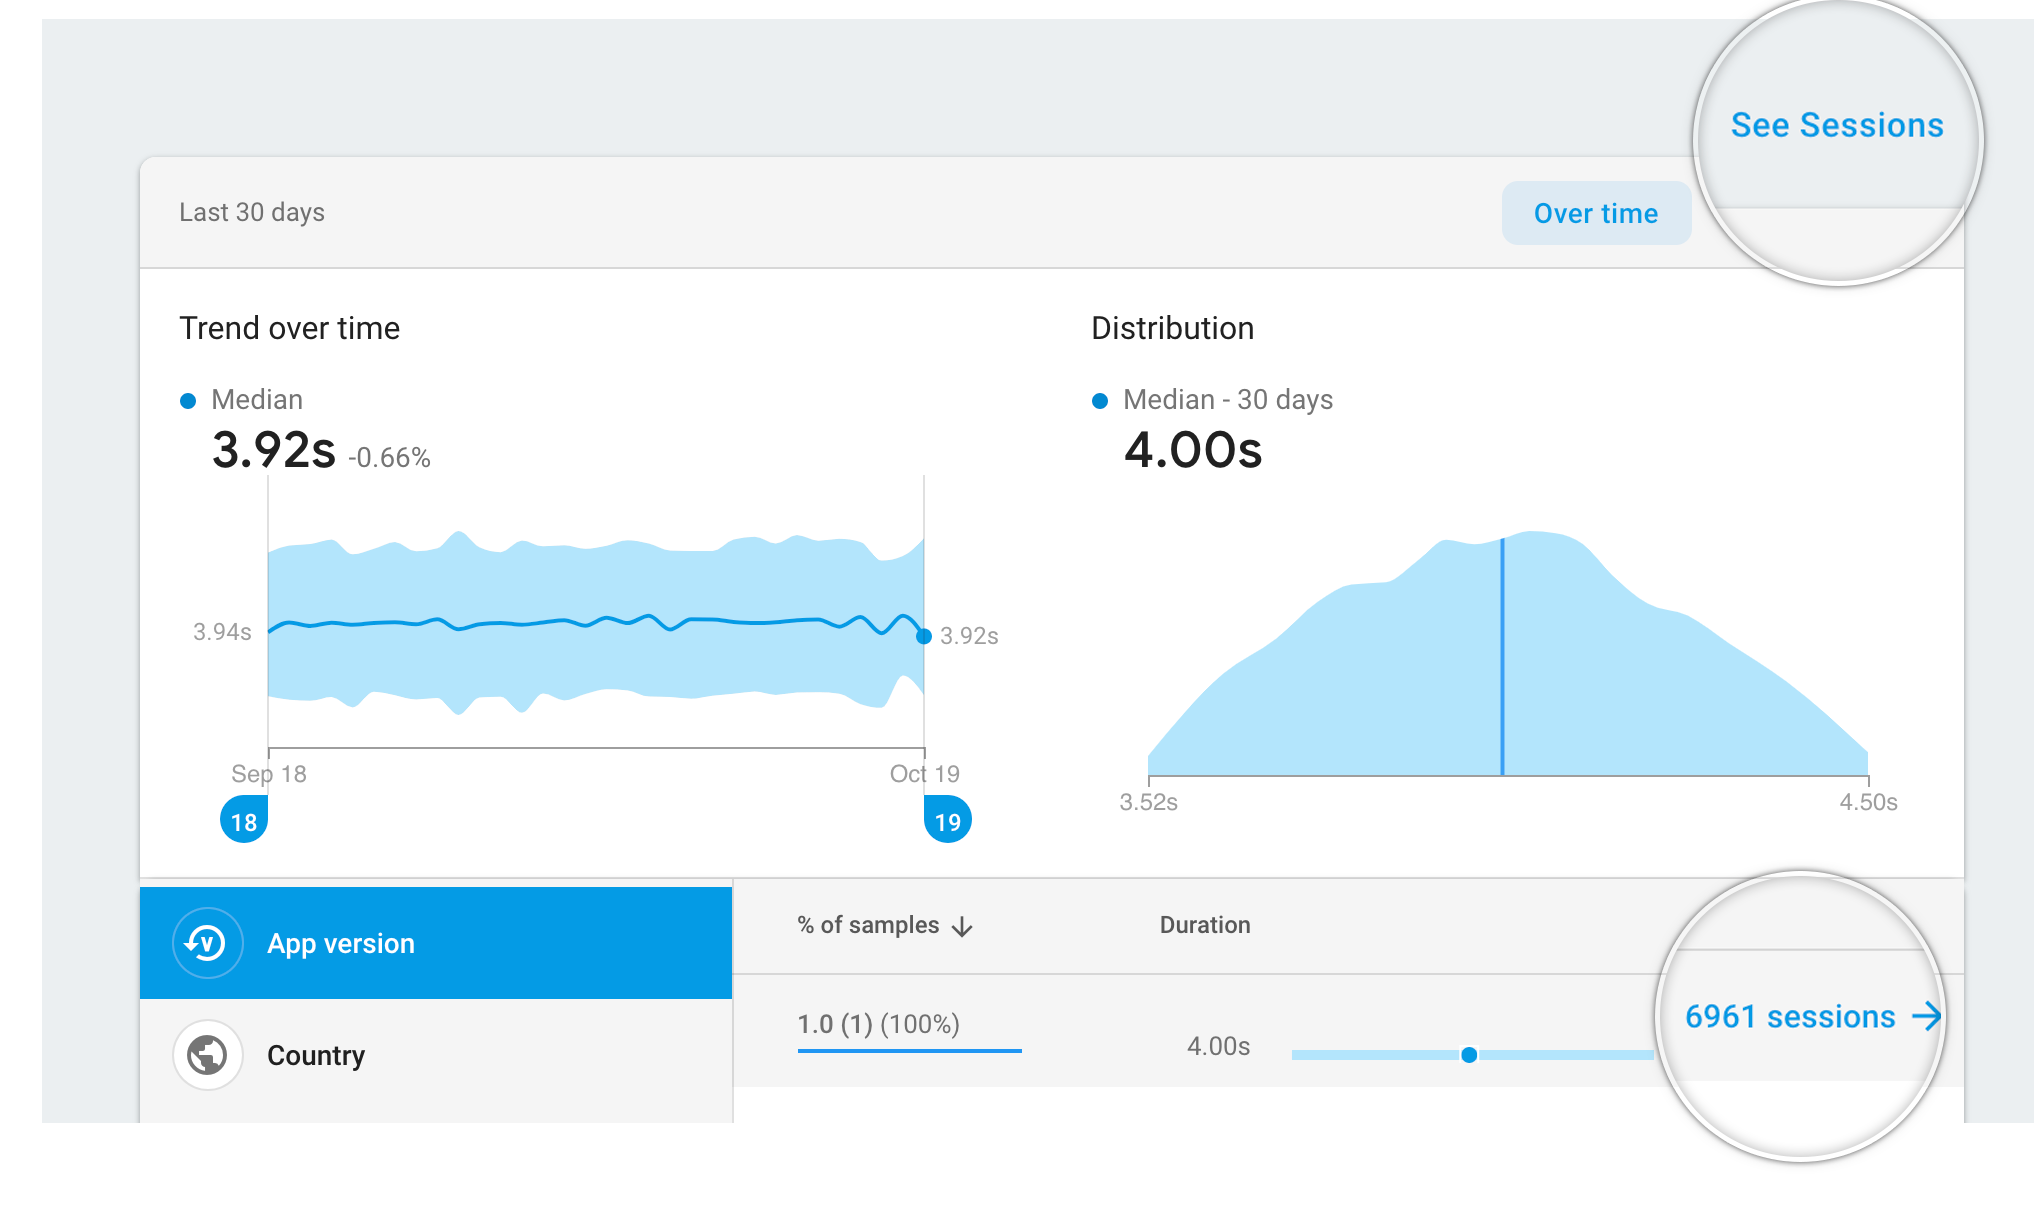 Firebase 性能监控跟踪记录的图像,其中包含指向会话的链接